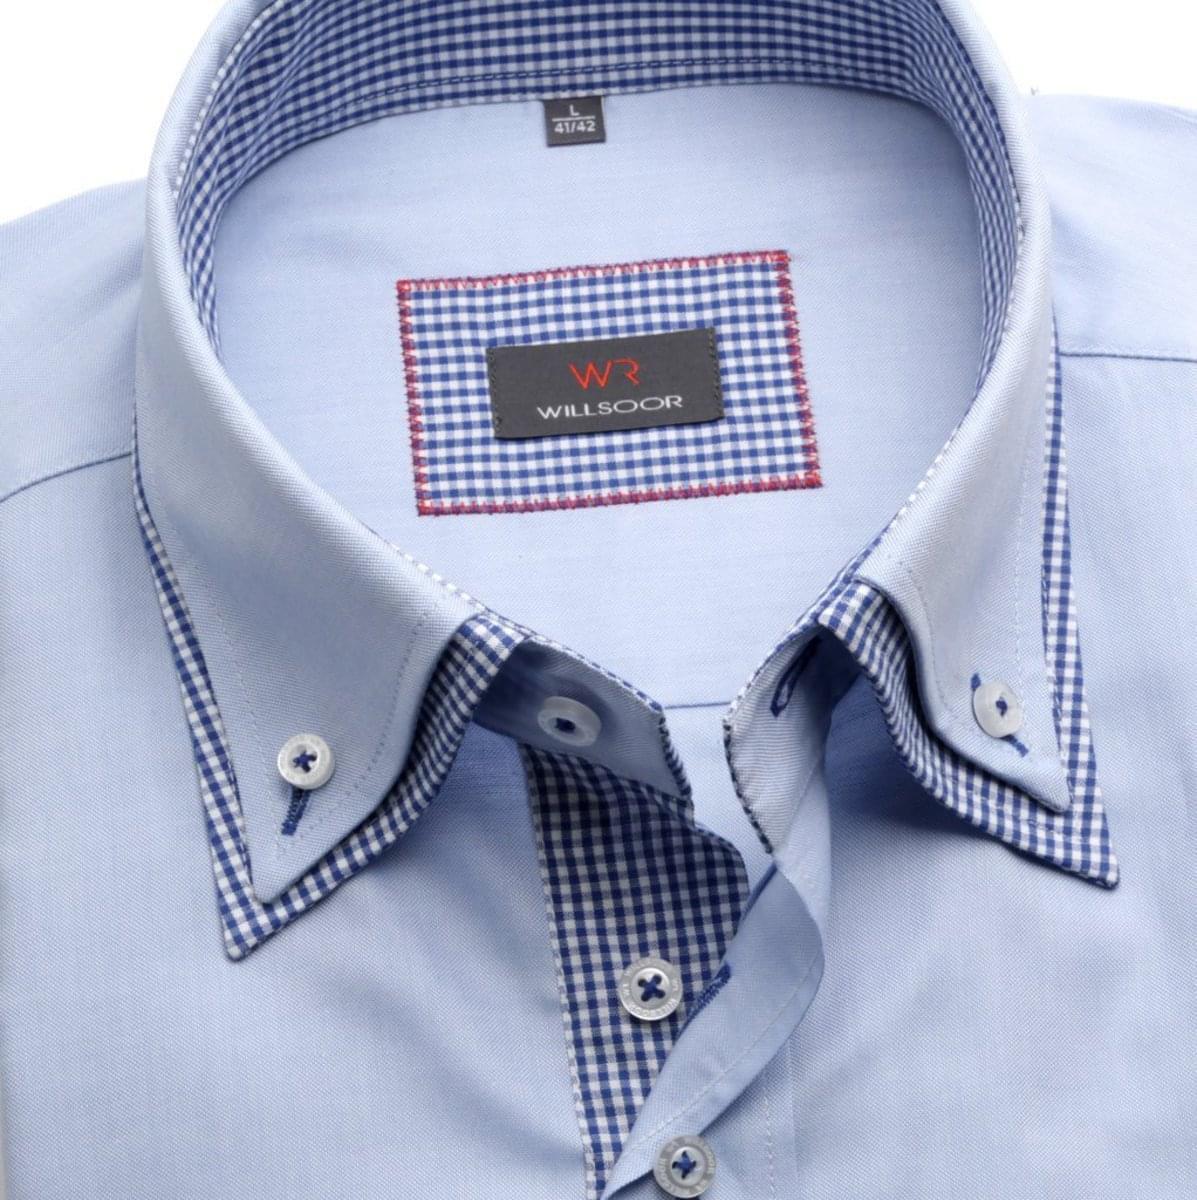 Willsoor Pánská košile WR Classic (výška 188-194) 1989 188-194 / L (41/42)